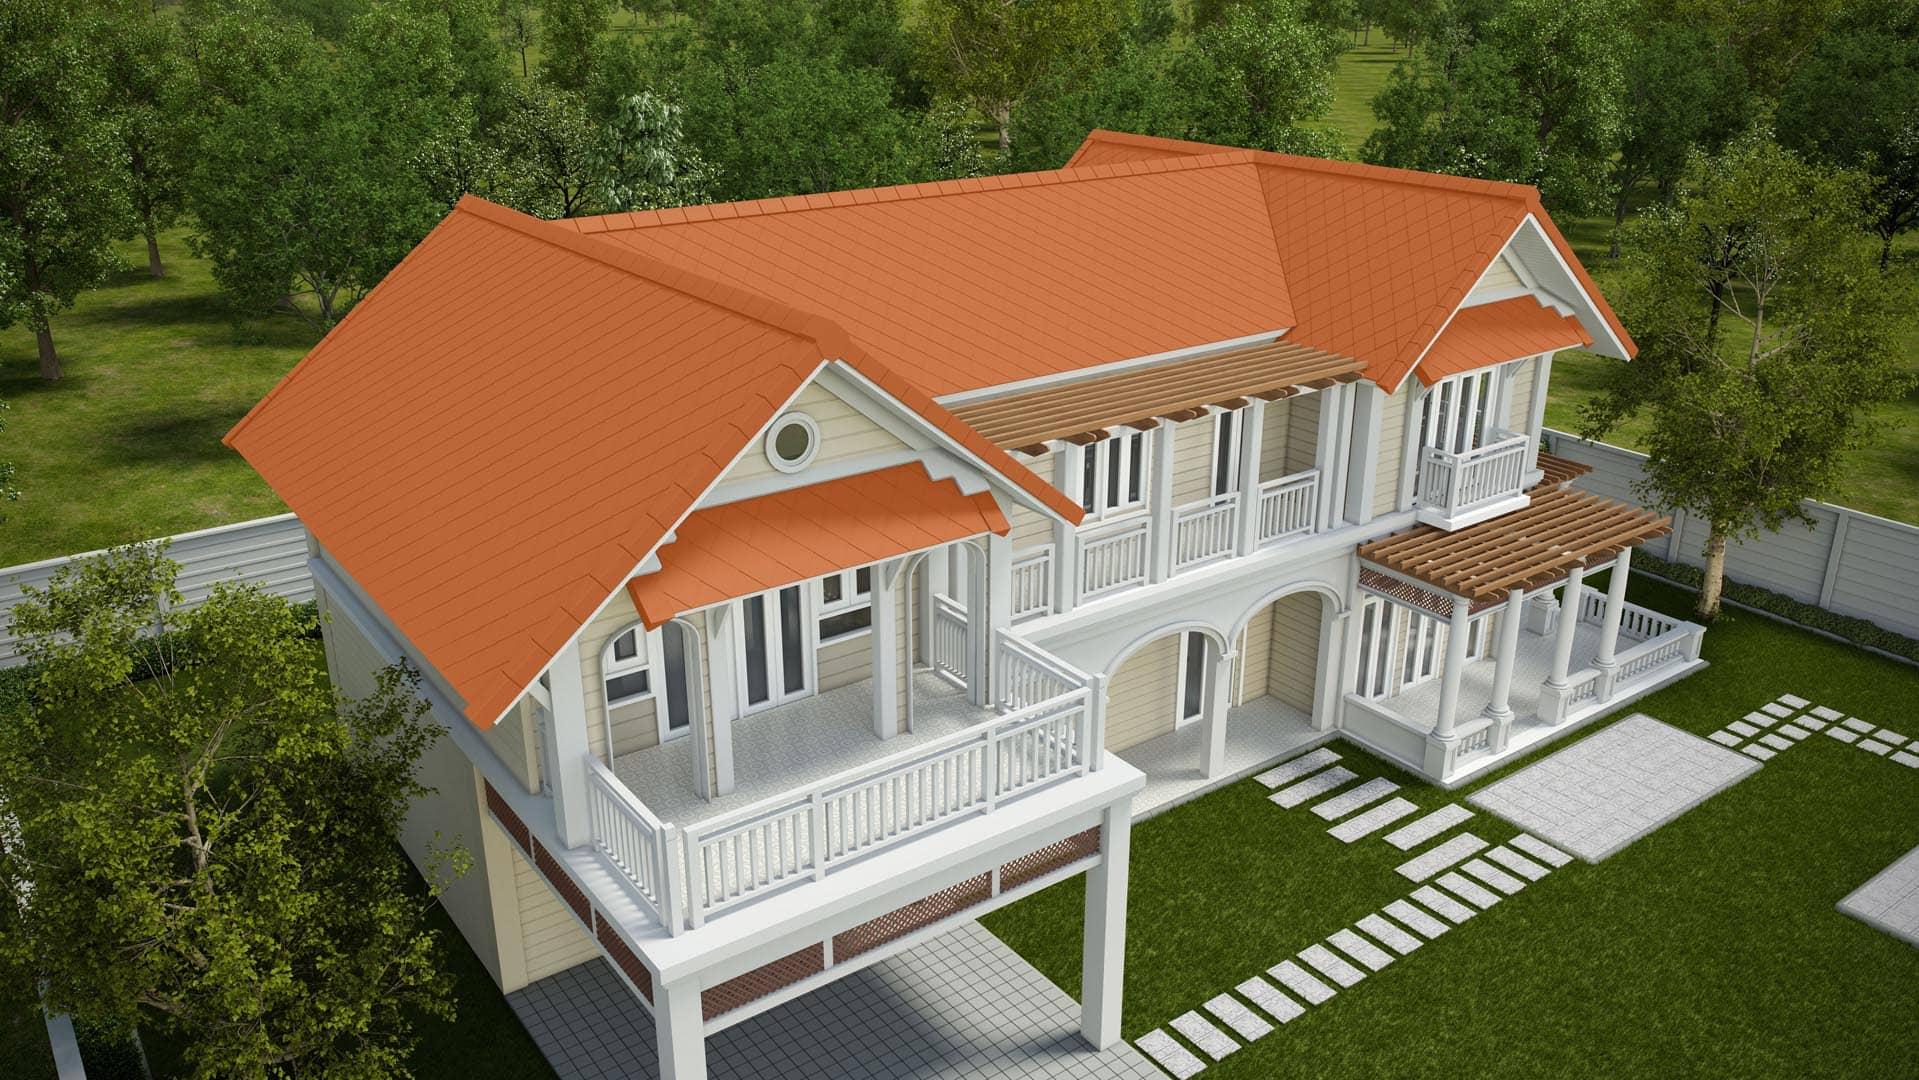 Fiber Cement Roof Ayara Classic Natural Brick site reference 3